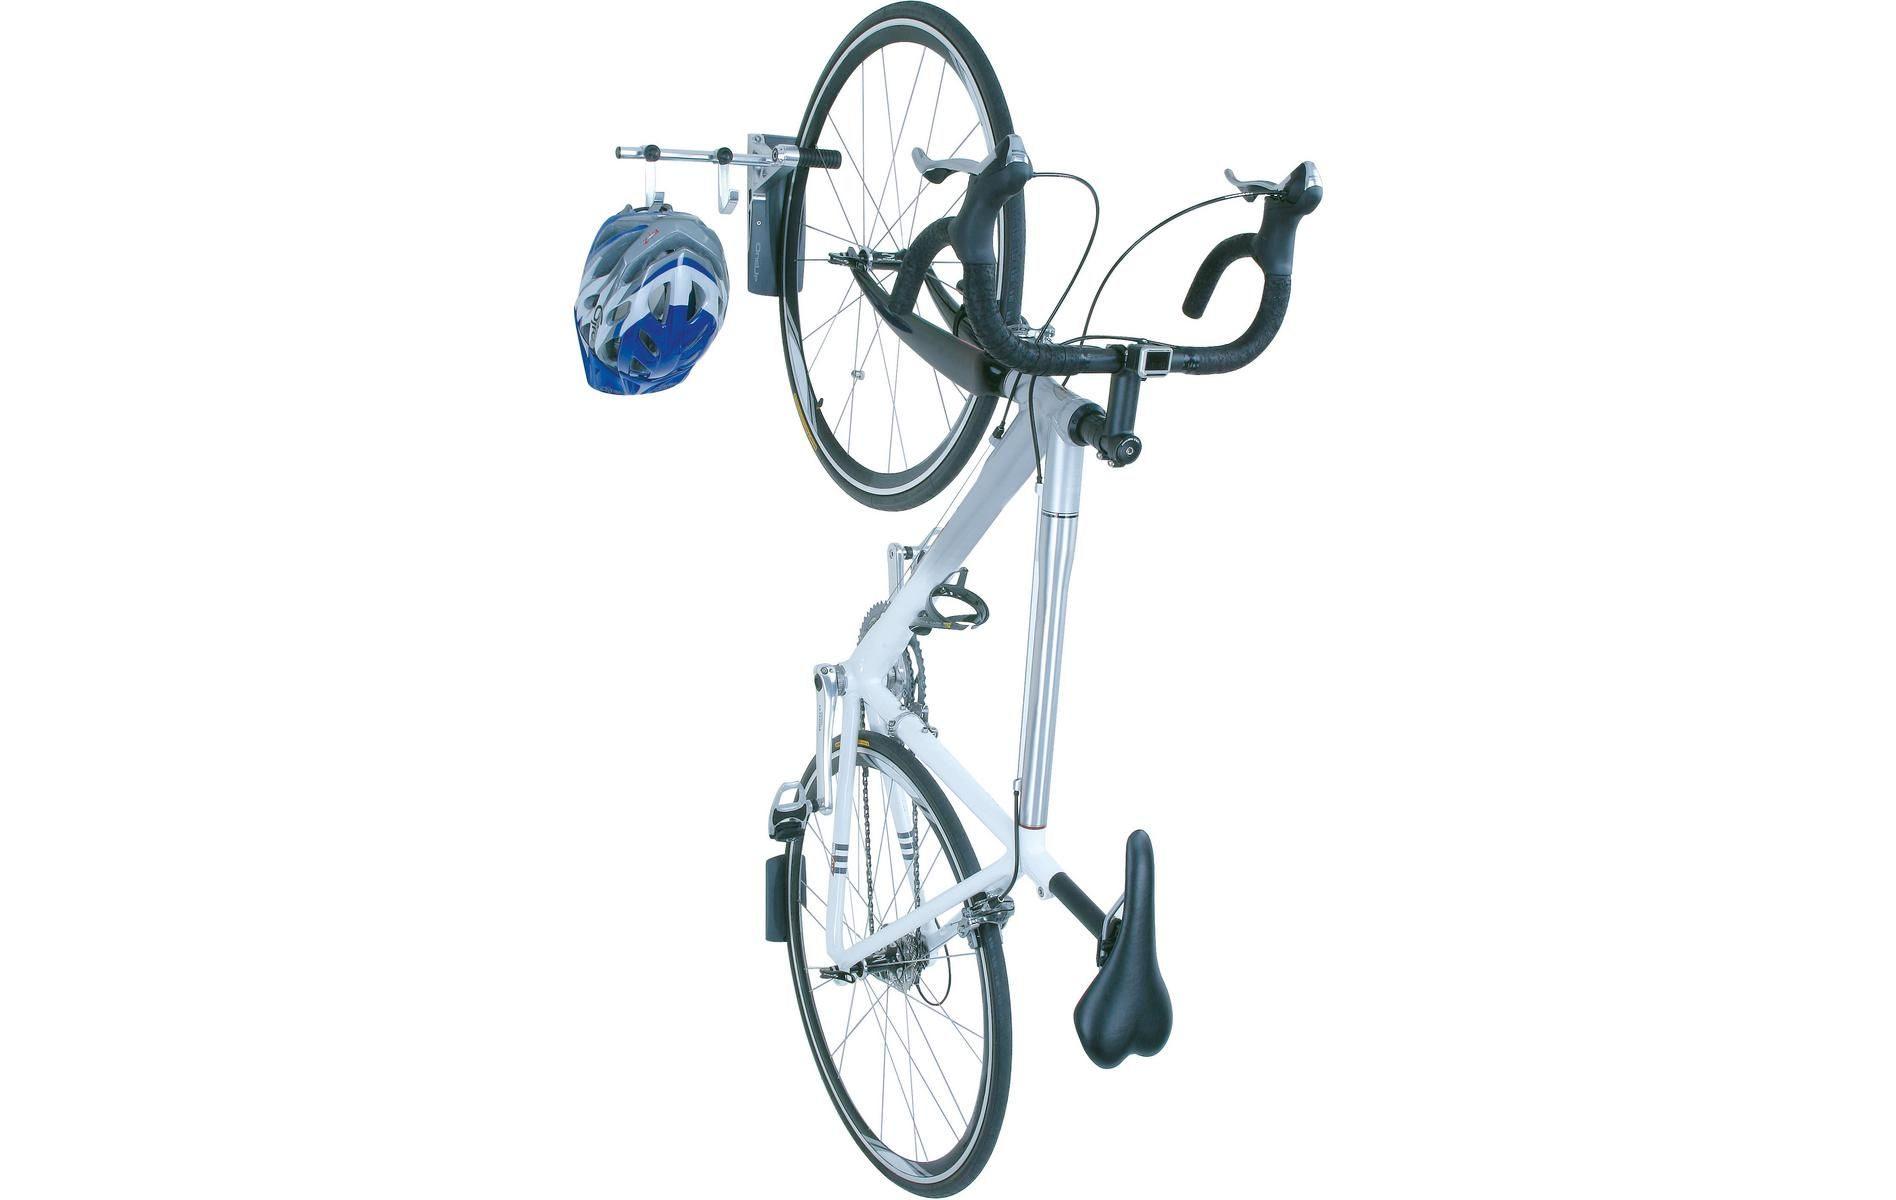 Topeak One Up Bike Holder Bike Storage Garage Indoor Bike